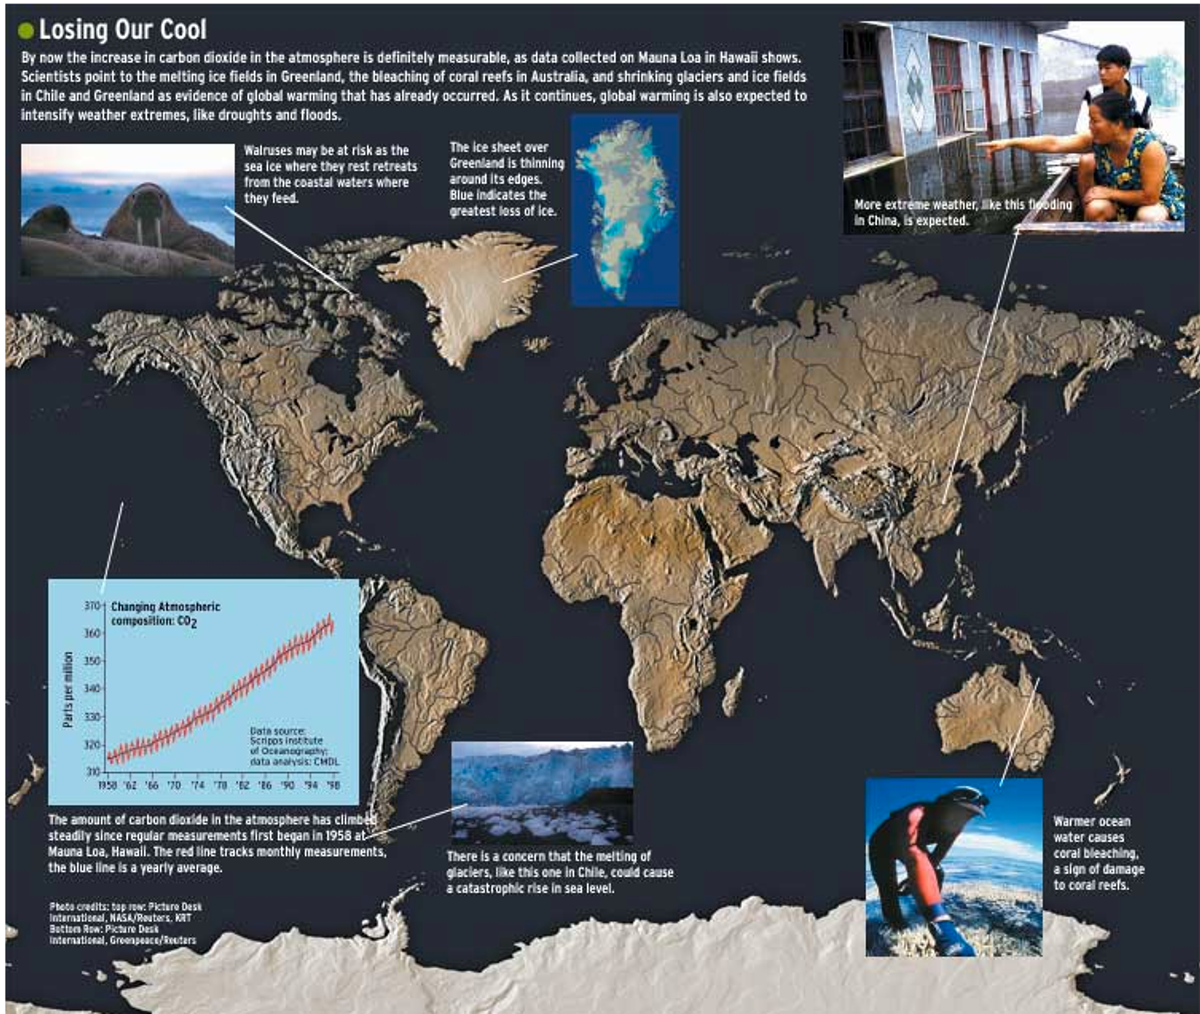 Capturing Climate Change